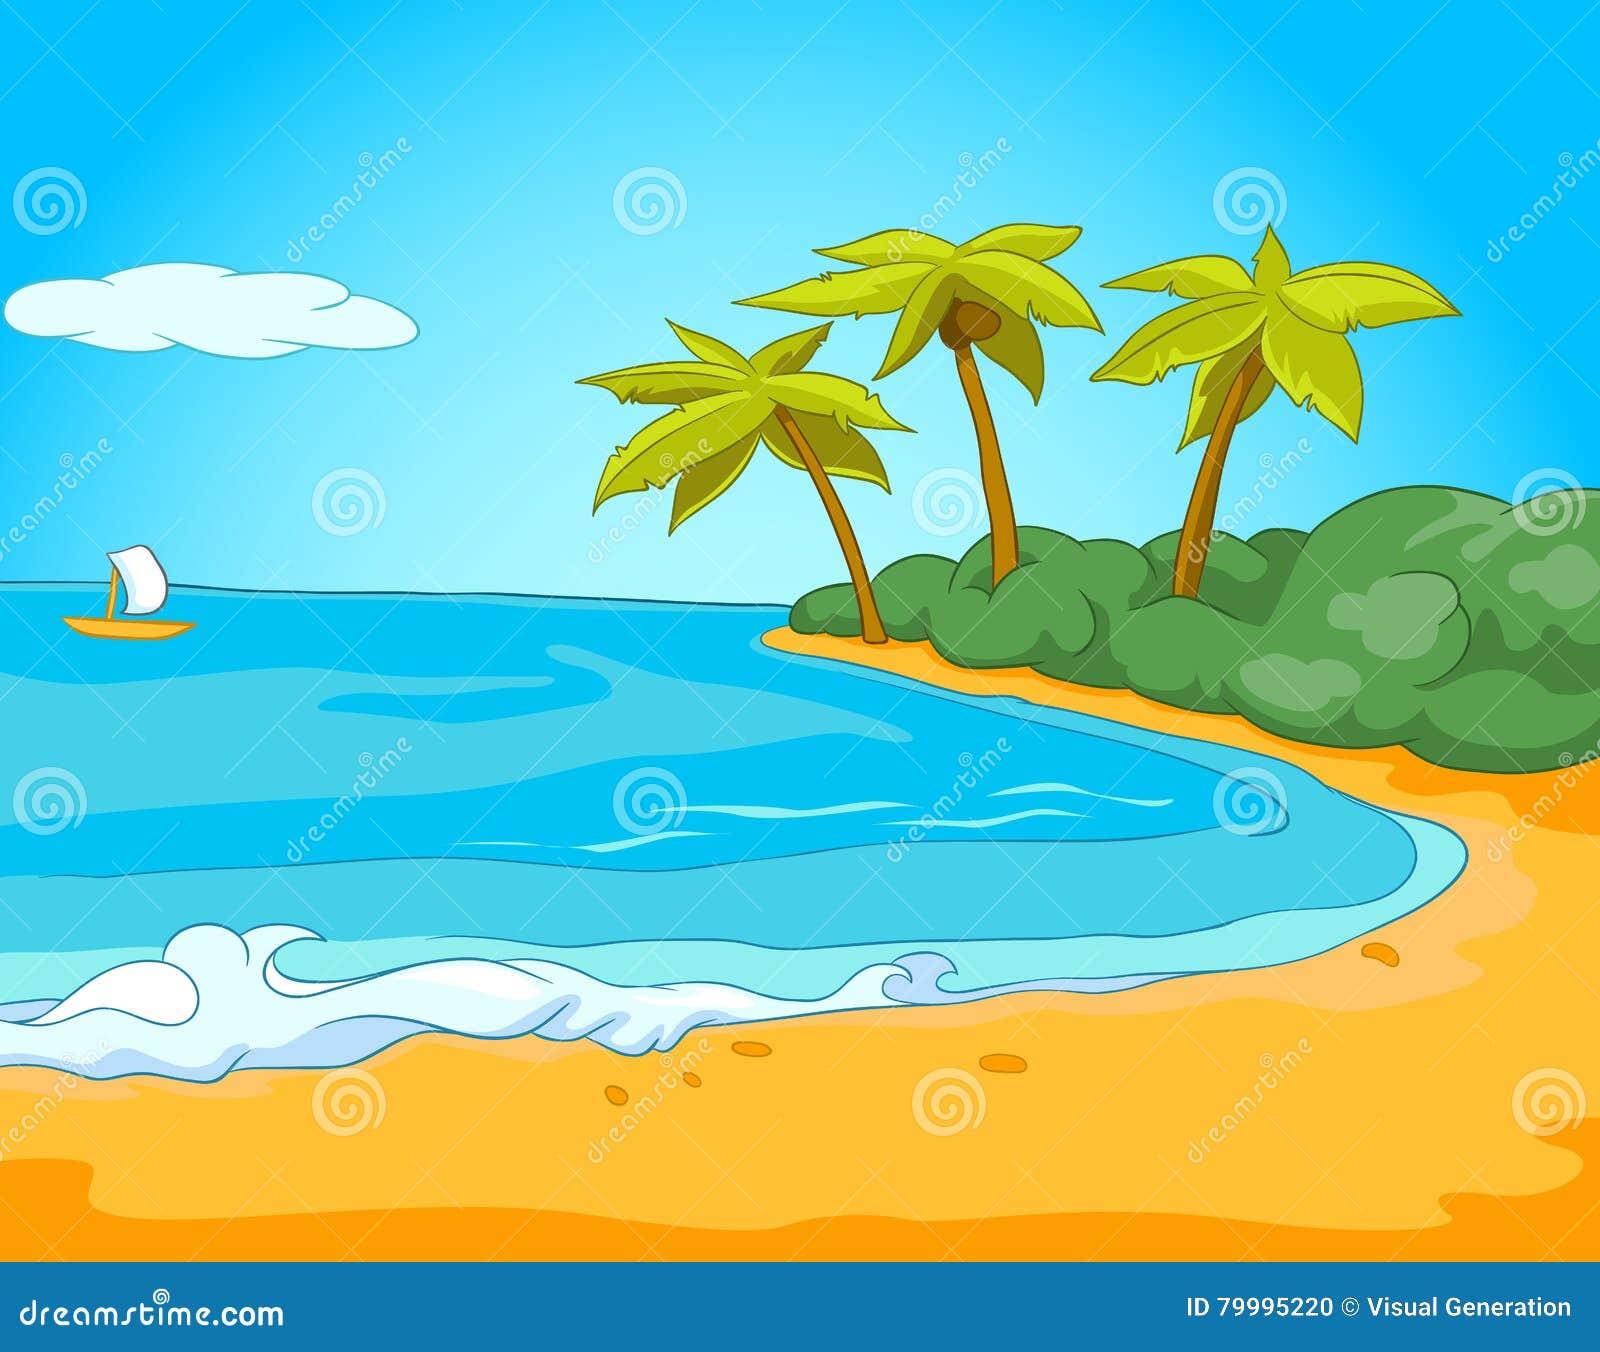 Cartoon Background Of Tropical Beach And Sea Stock